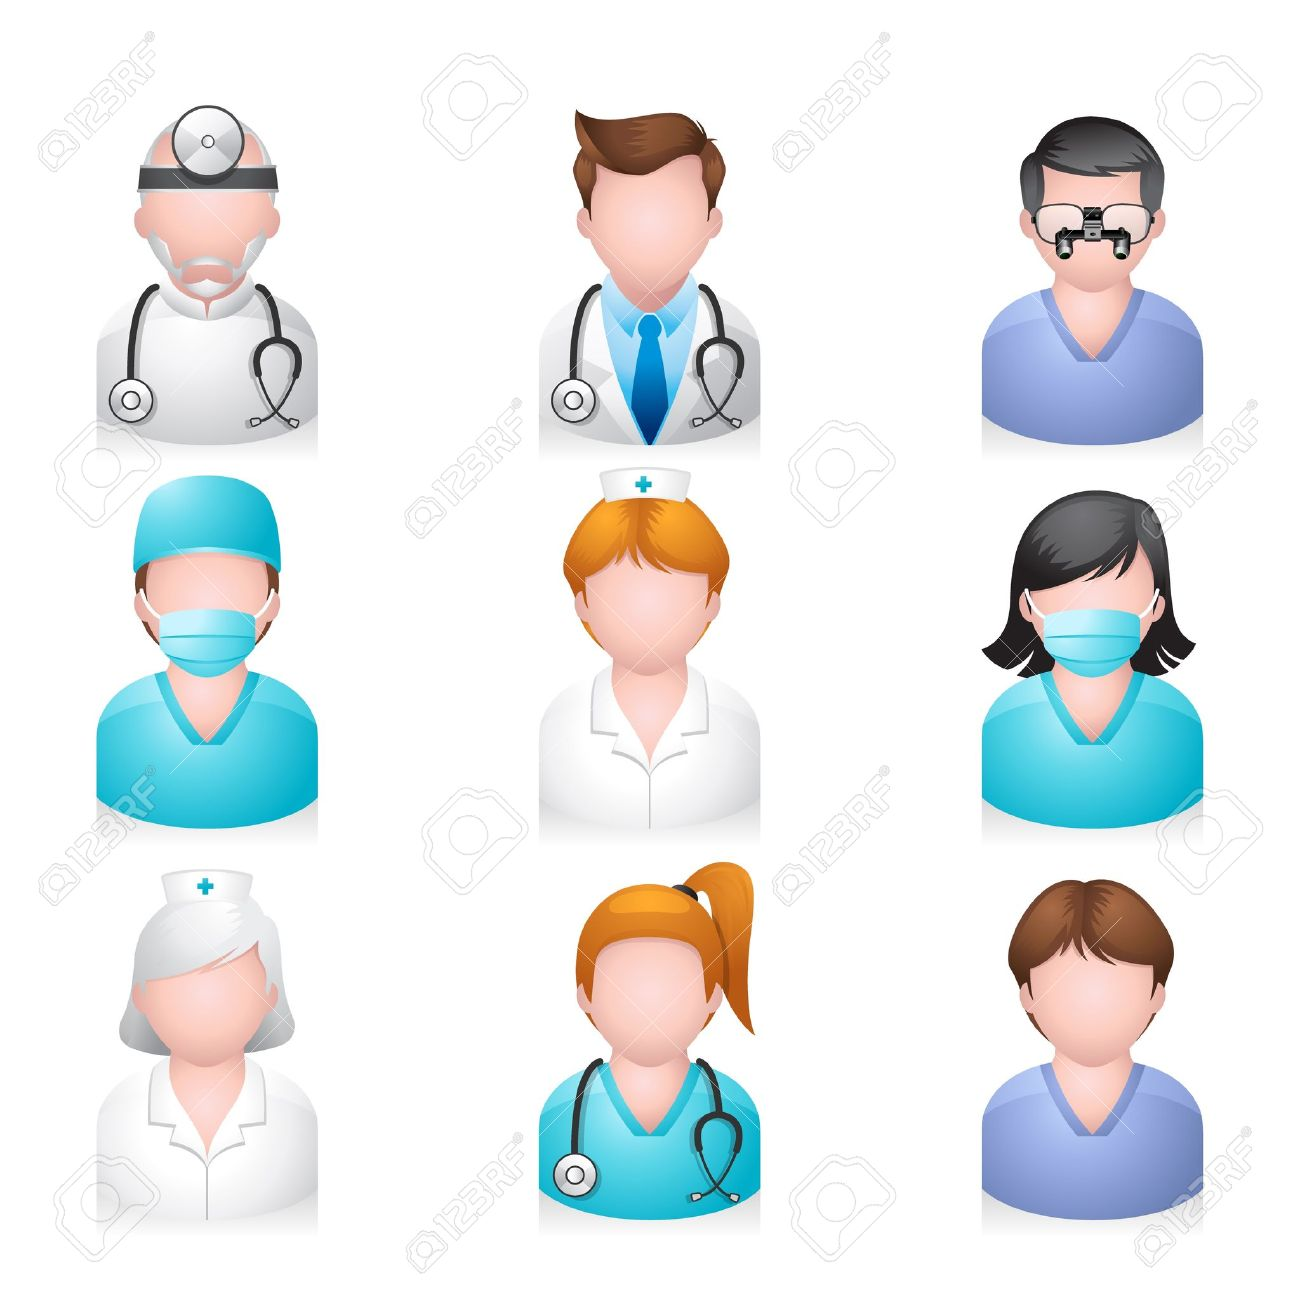 Medical people icon set - 13650399